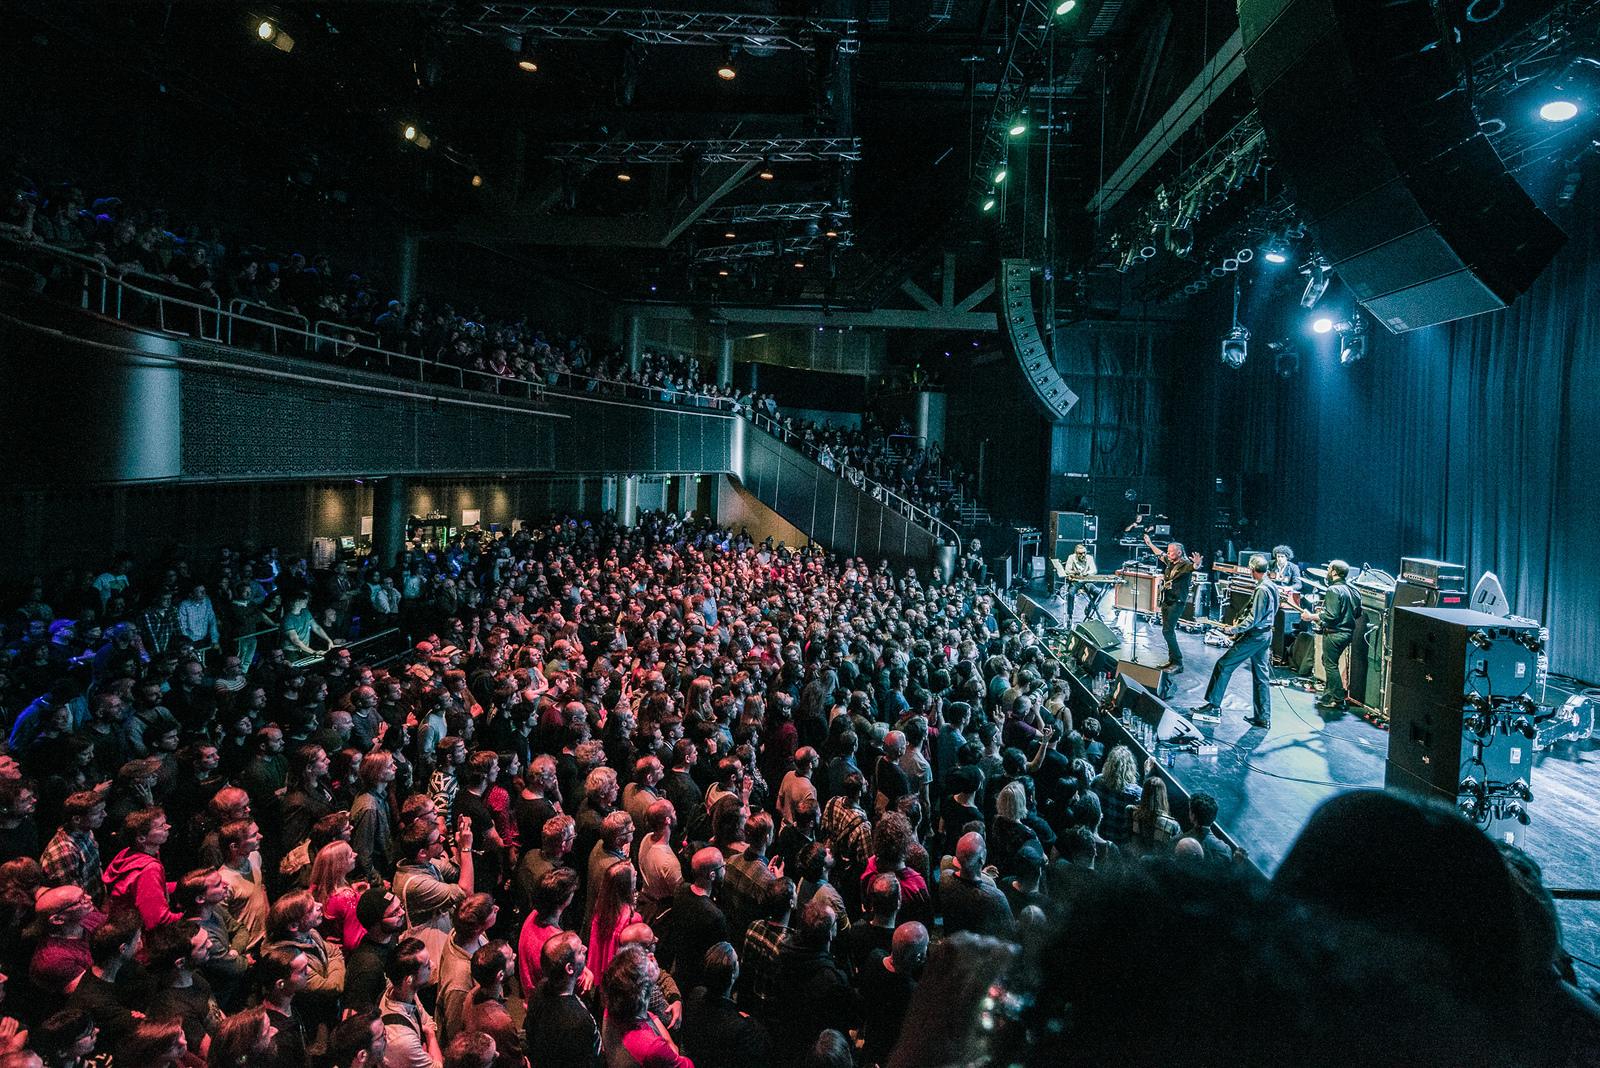 Le Guess Who? 2017 amongst FlightNetwork's Best Music Festivals in Europe